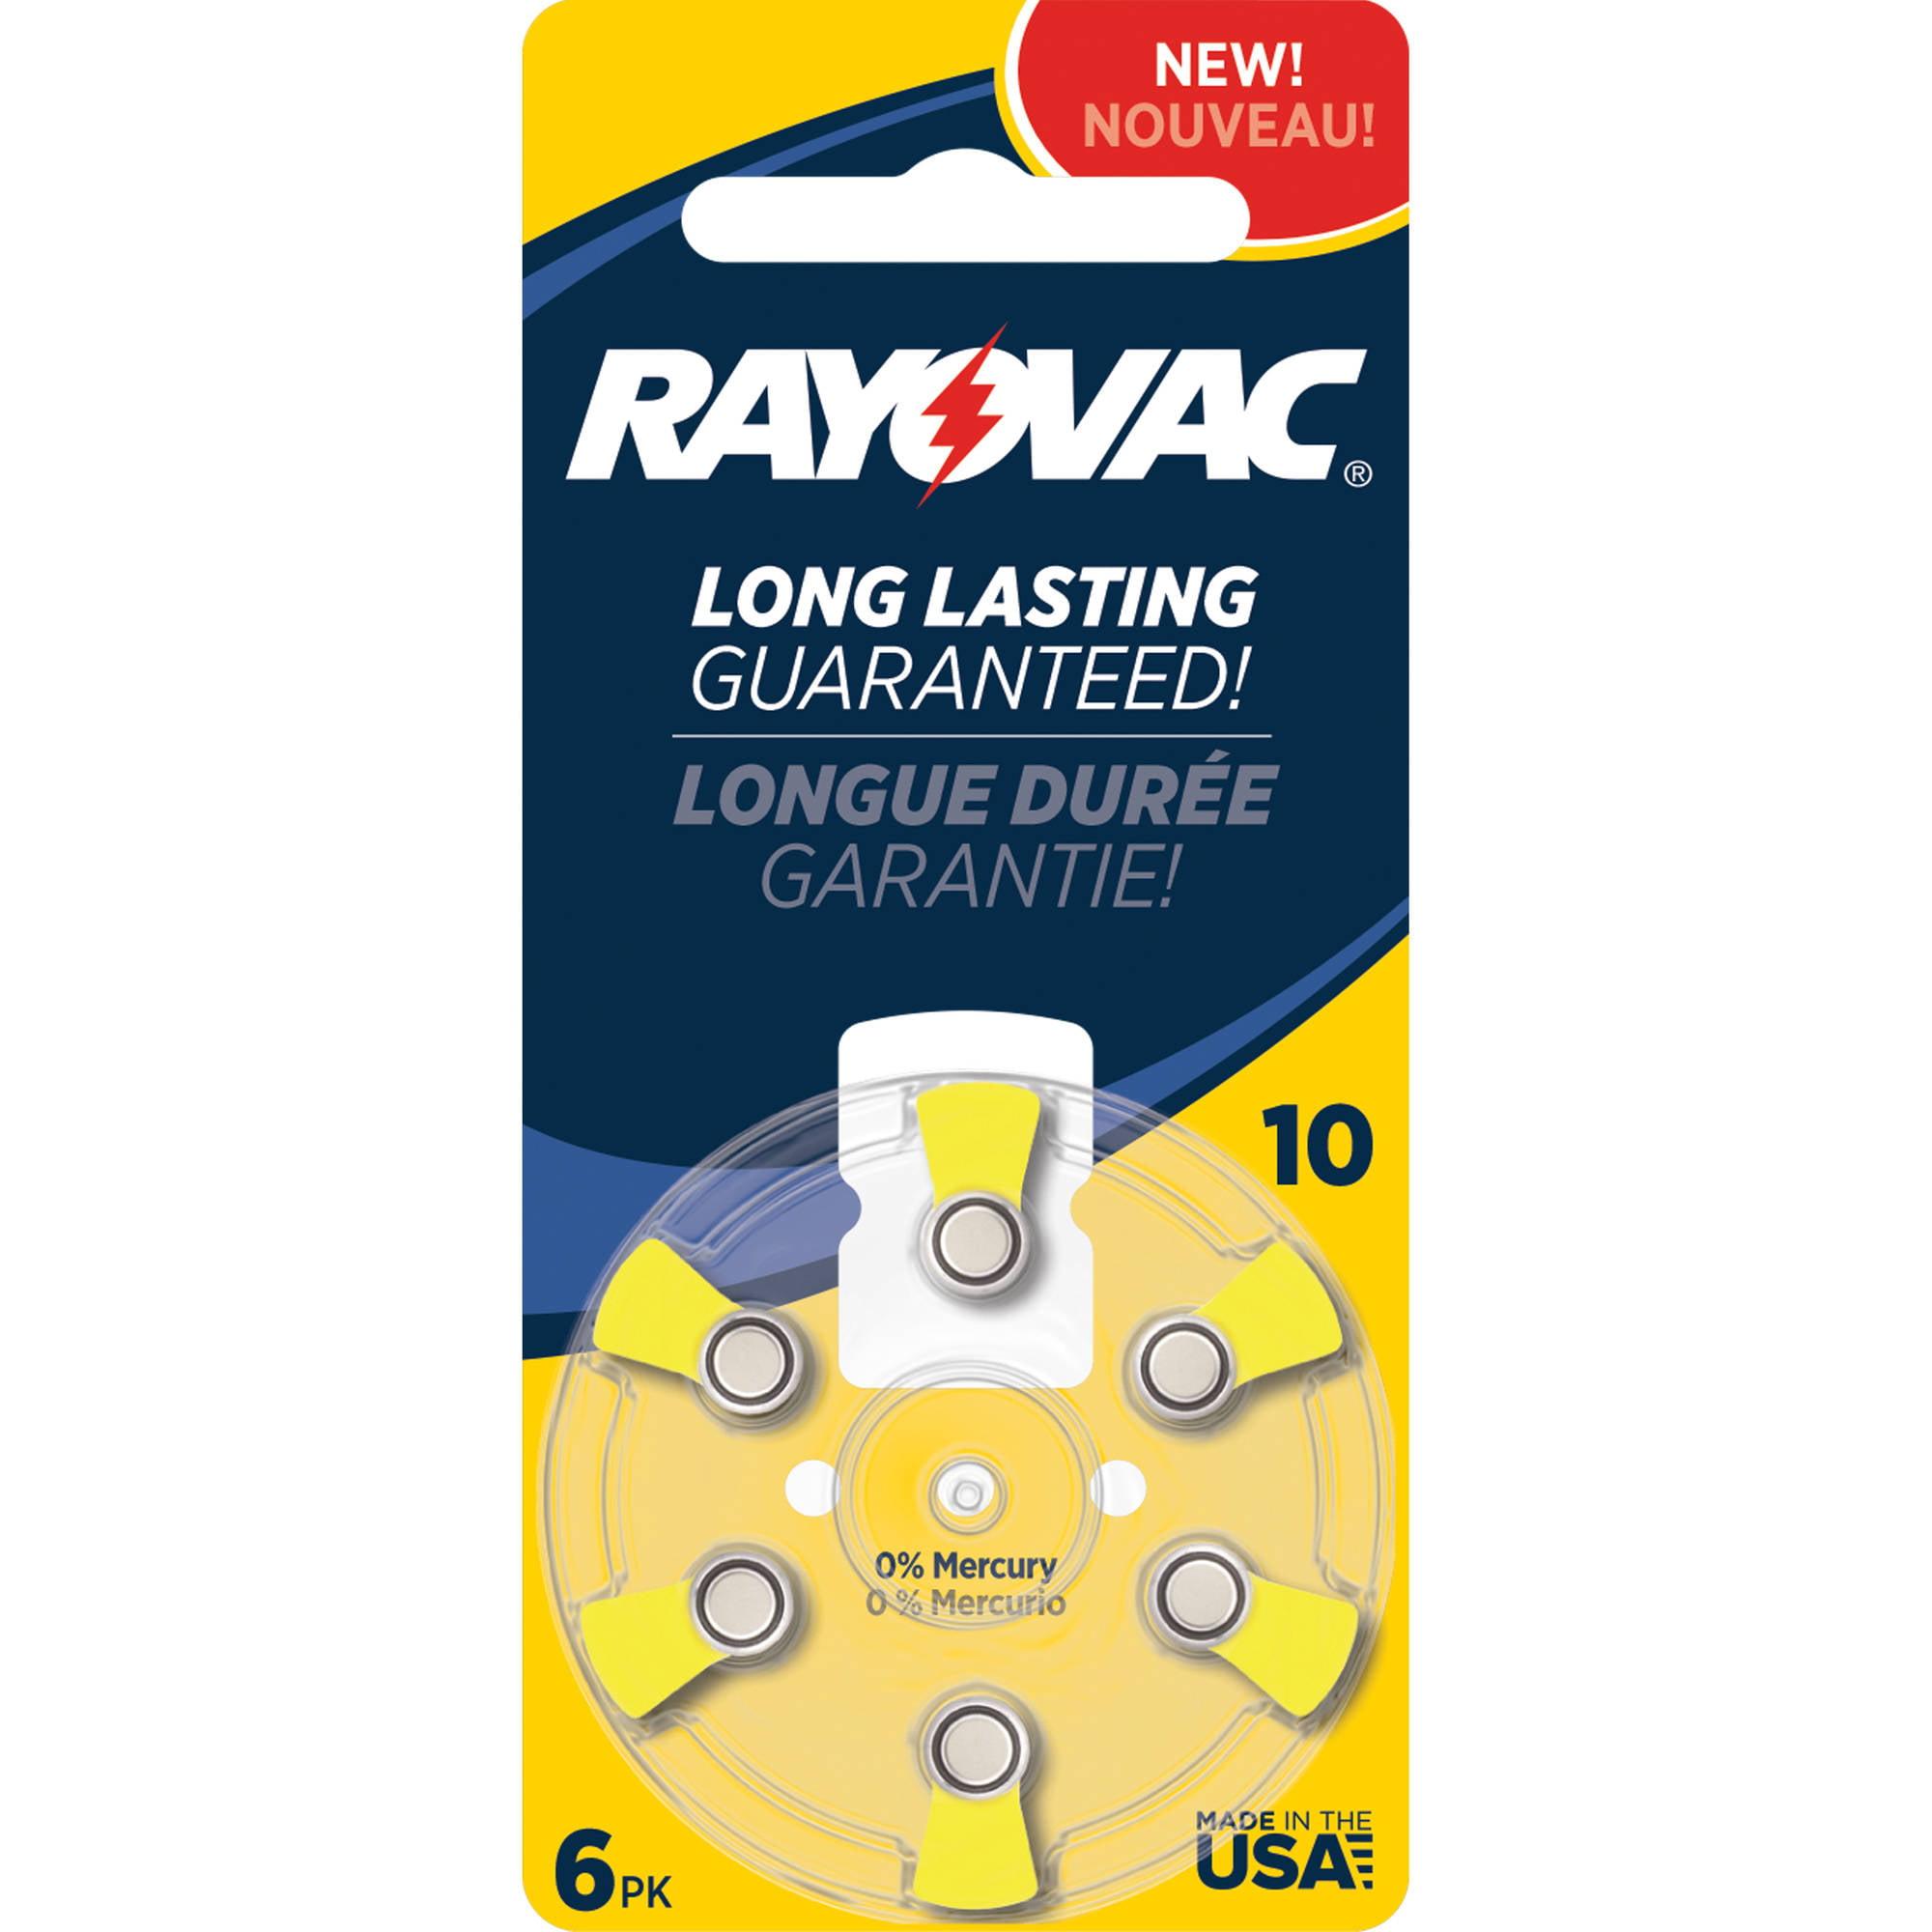 Rayovac Size 10 Hearing Aid Battery Mercury Free Batteries, 6pk